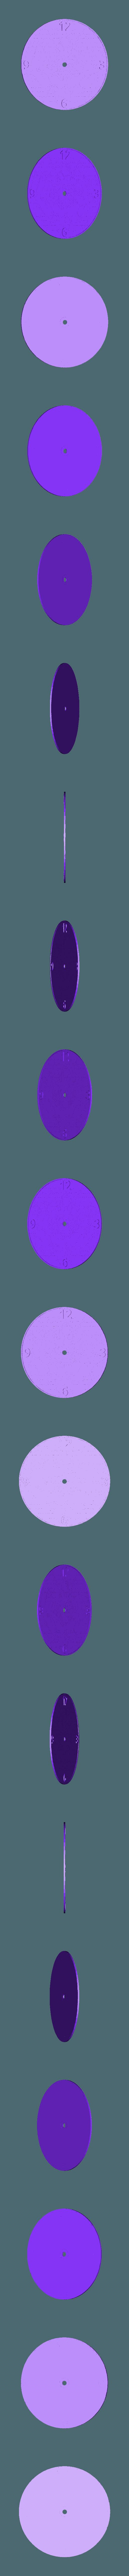 reloj_zebra_spiderman.stl Télécharger fichier STL gratuit Reloj zebra Spiderman • Modèle à imprimer en 3D, 3dlito